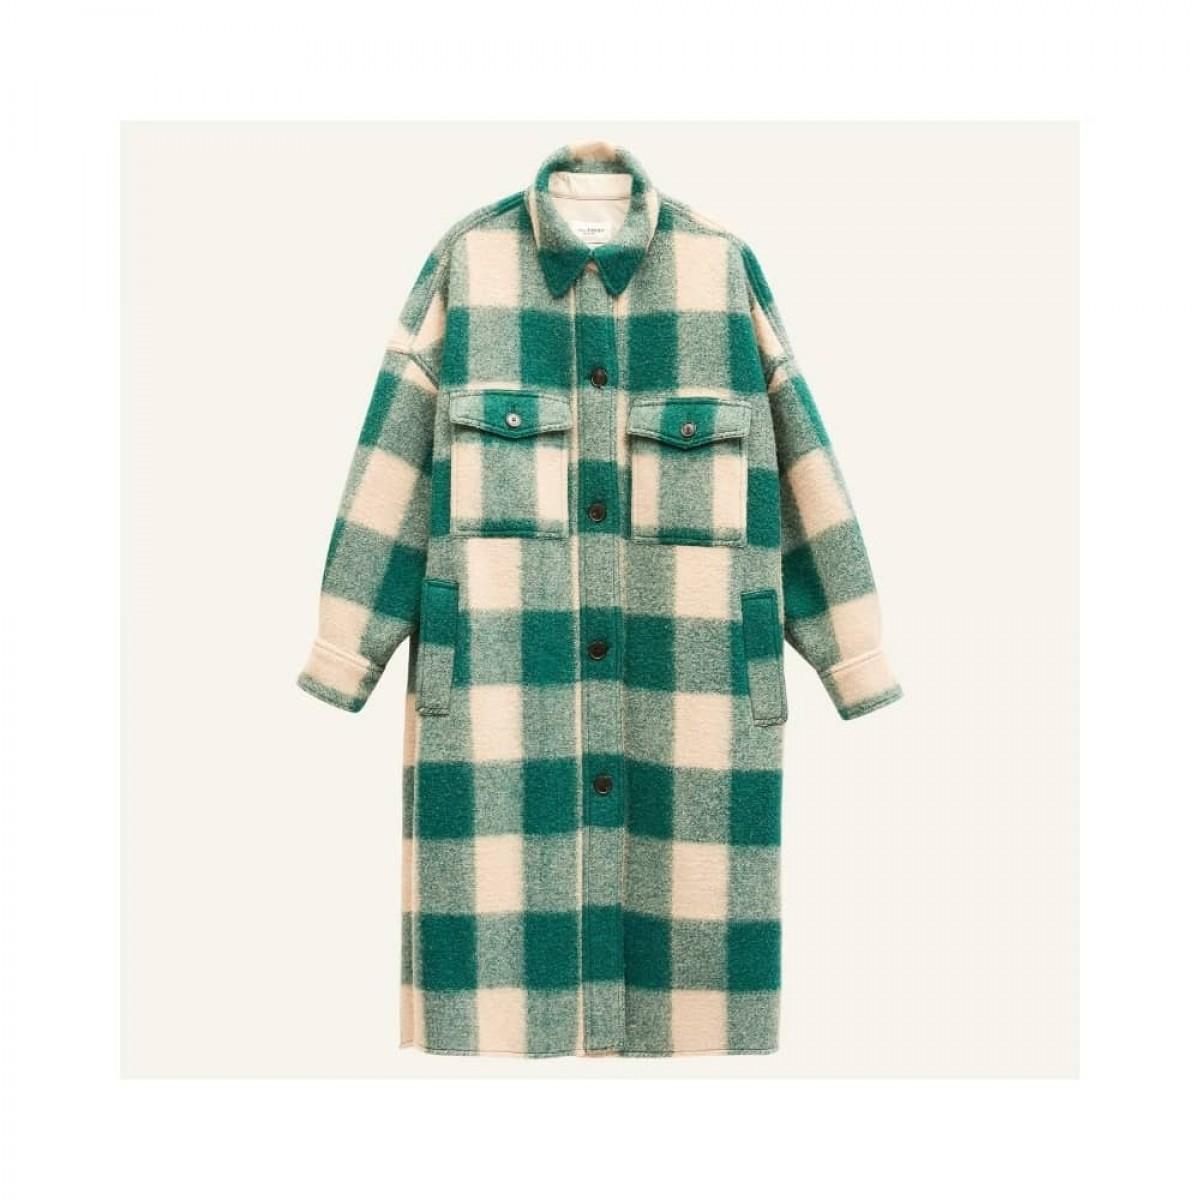 fontizi coat - green